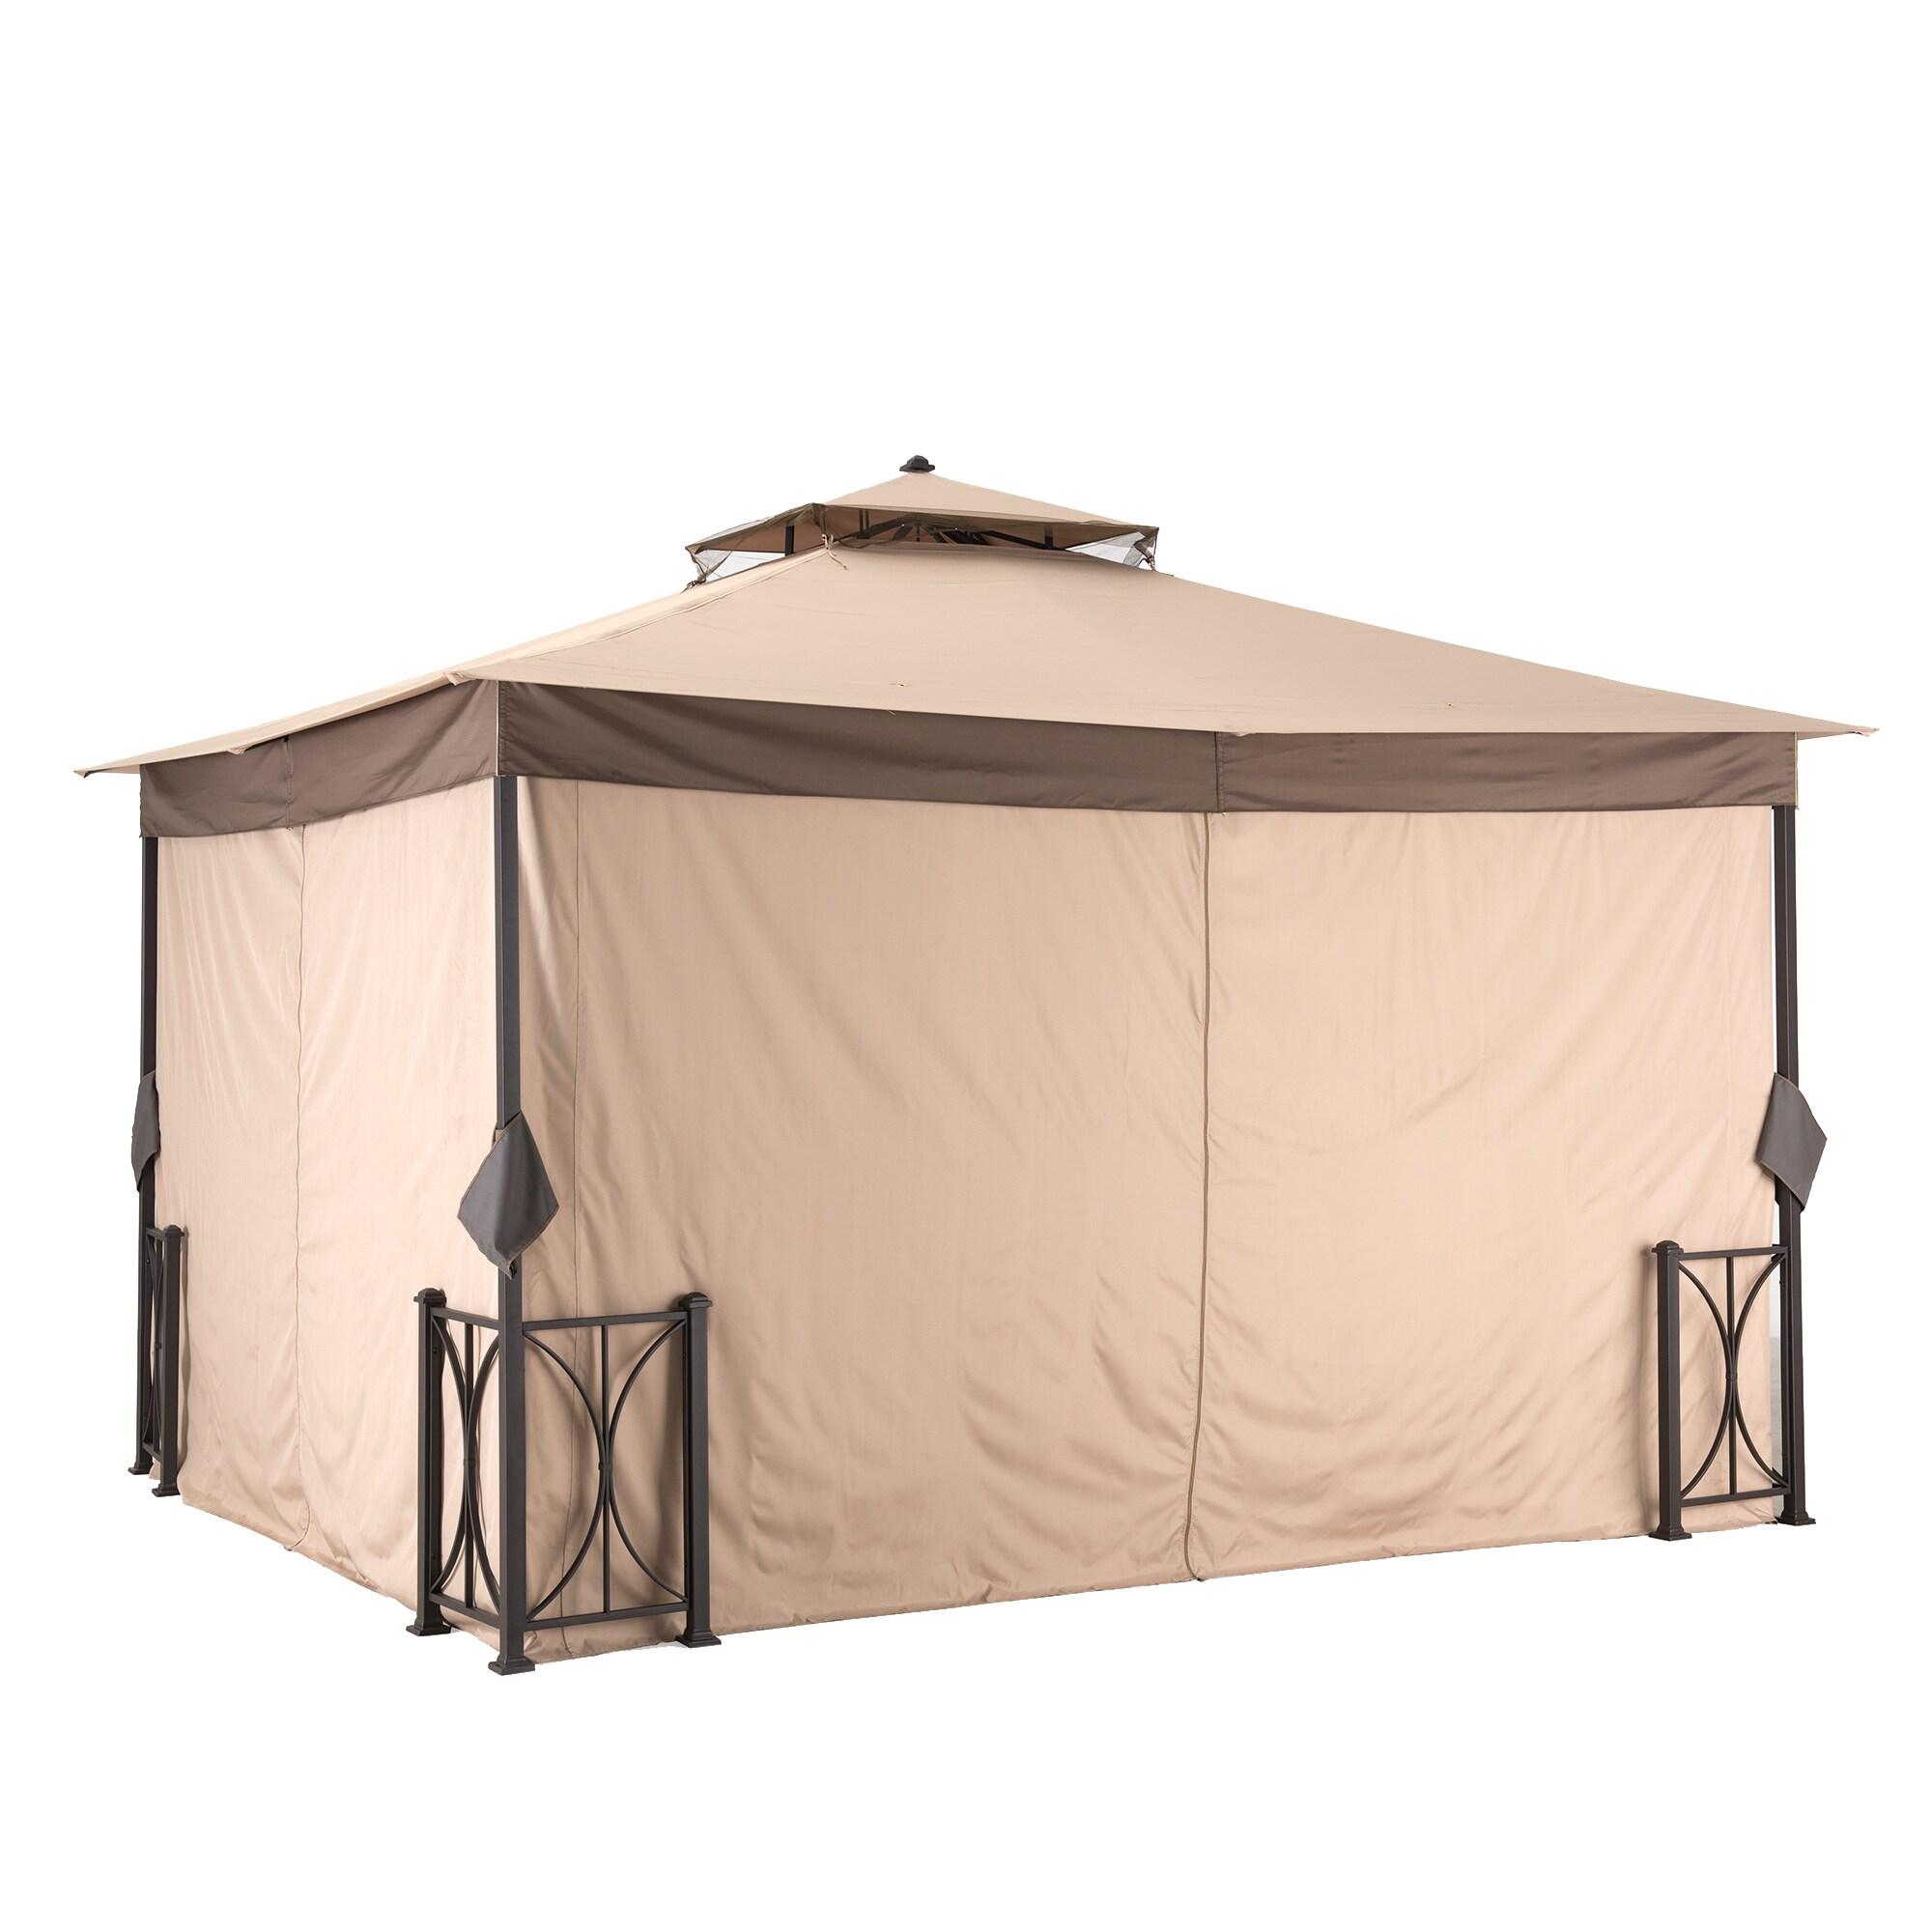 Sunjoy Belcourt Fabric Canopy Gazebo (10u0027 x 12u0027) - Free Shipping Today - Overstock.com - 20158292  sc 1 st  Overstock.com & Sunjoy Belcourt Fabric Canopy Gazebo (10u0027 x 12u0027) - Free Shipping ...